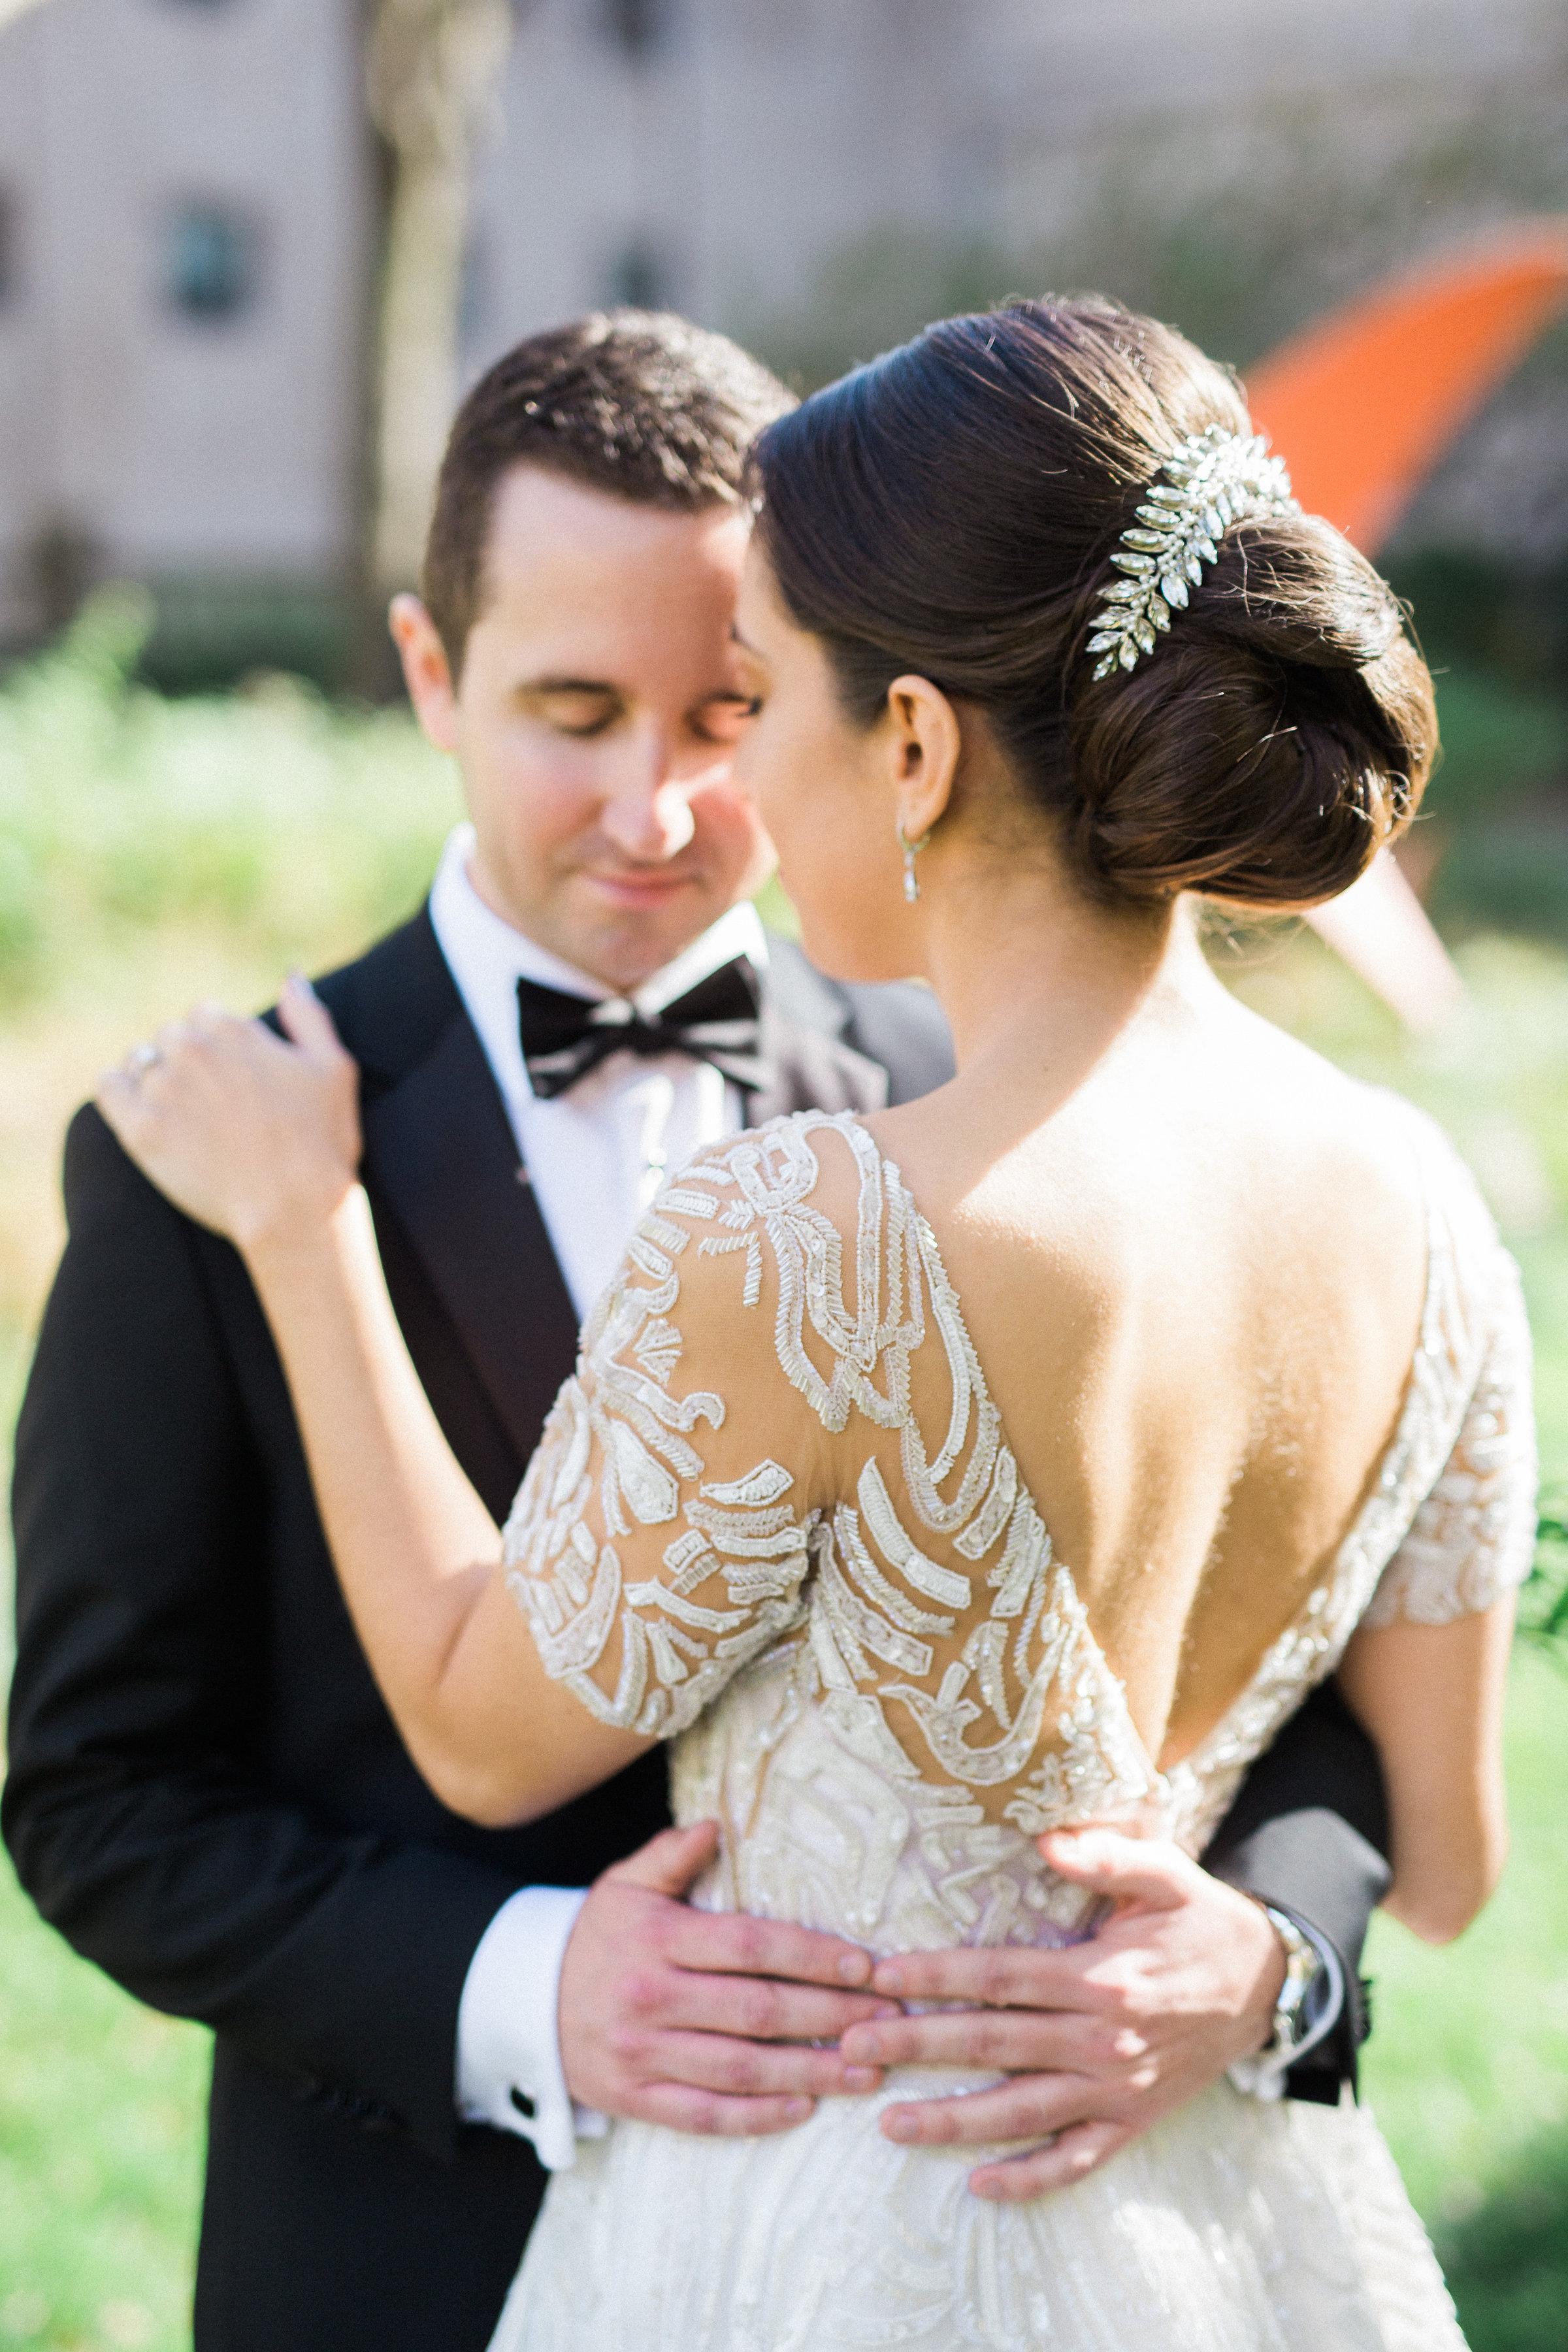 Bride wearing Zuhair Muradwedding gown at her luxury wedding at Chicago Cultural Centerin Chicago